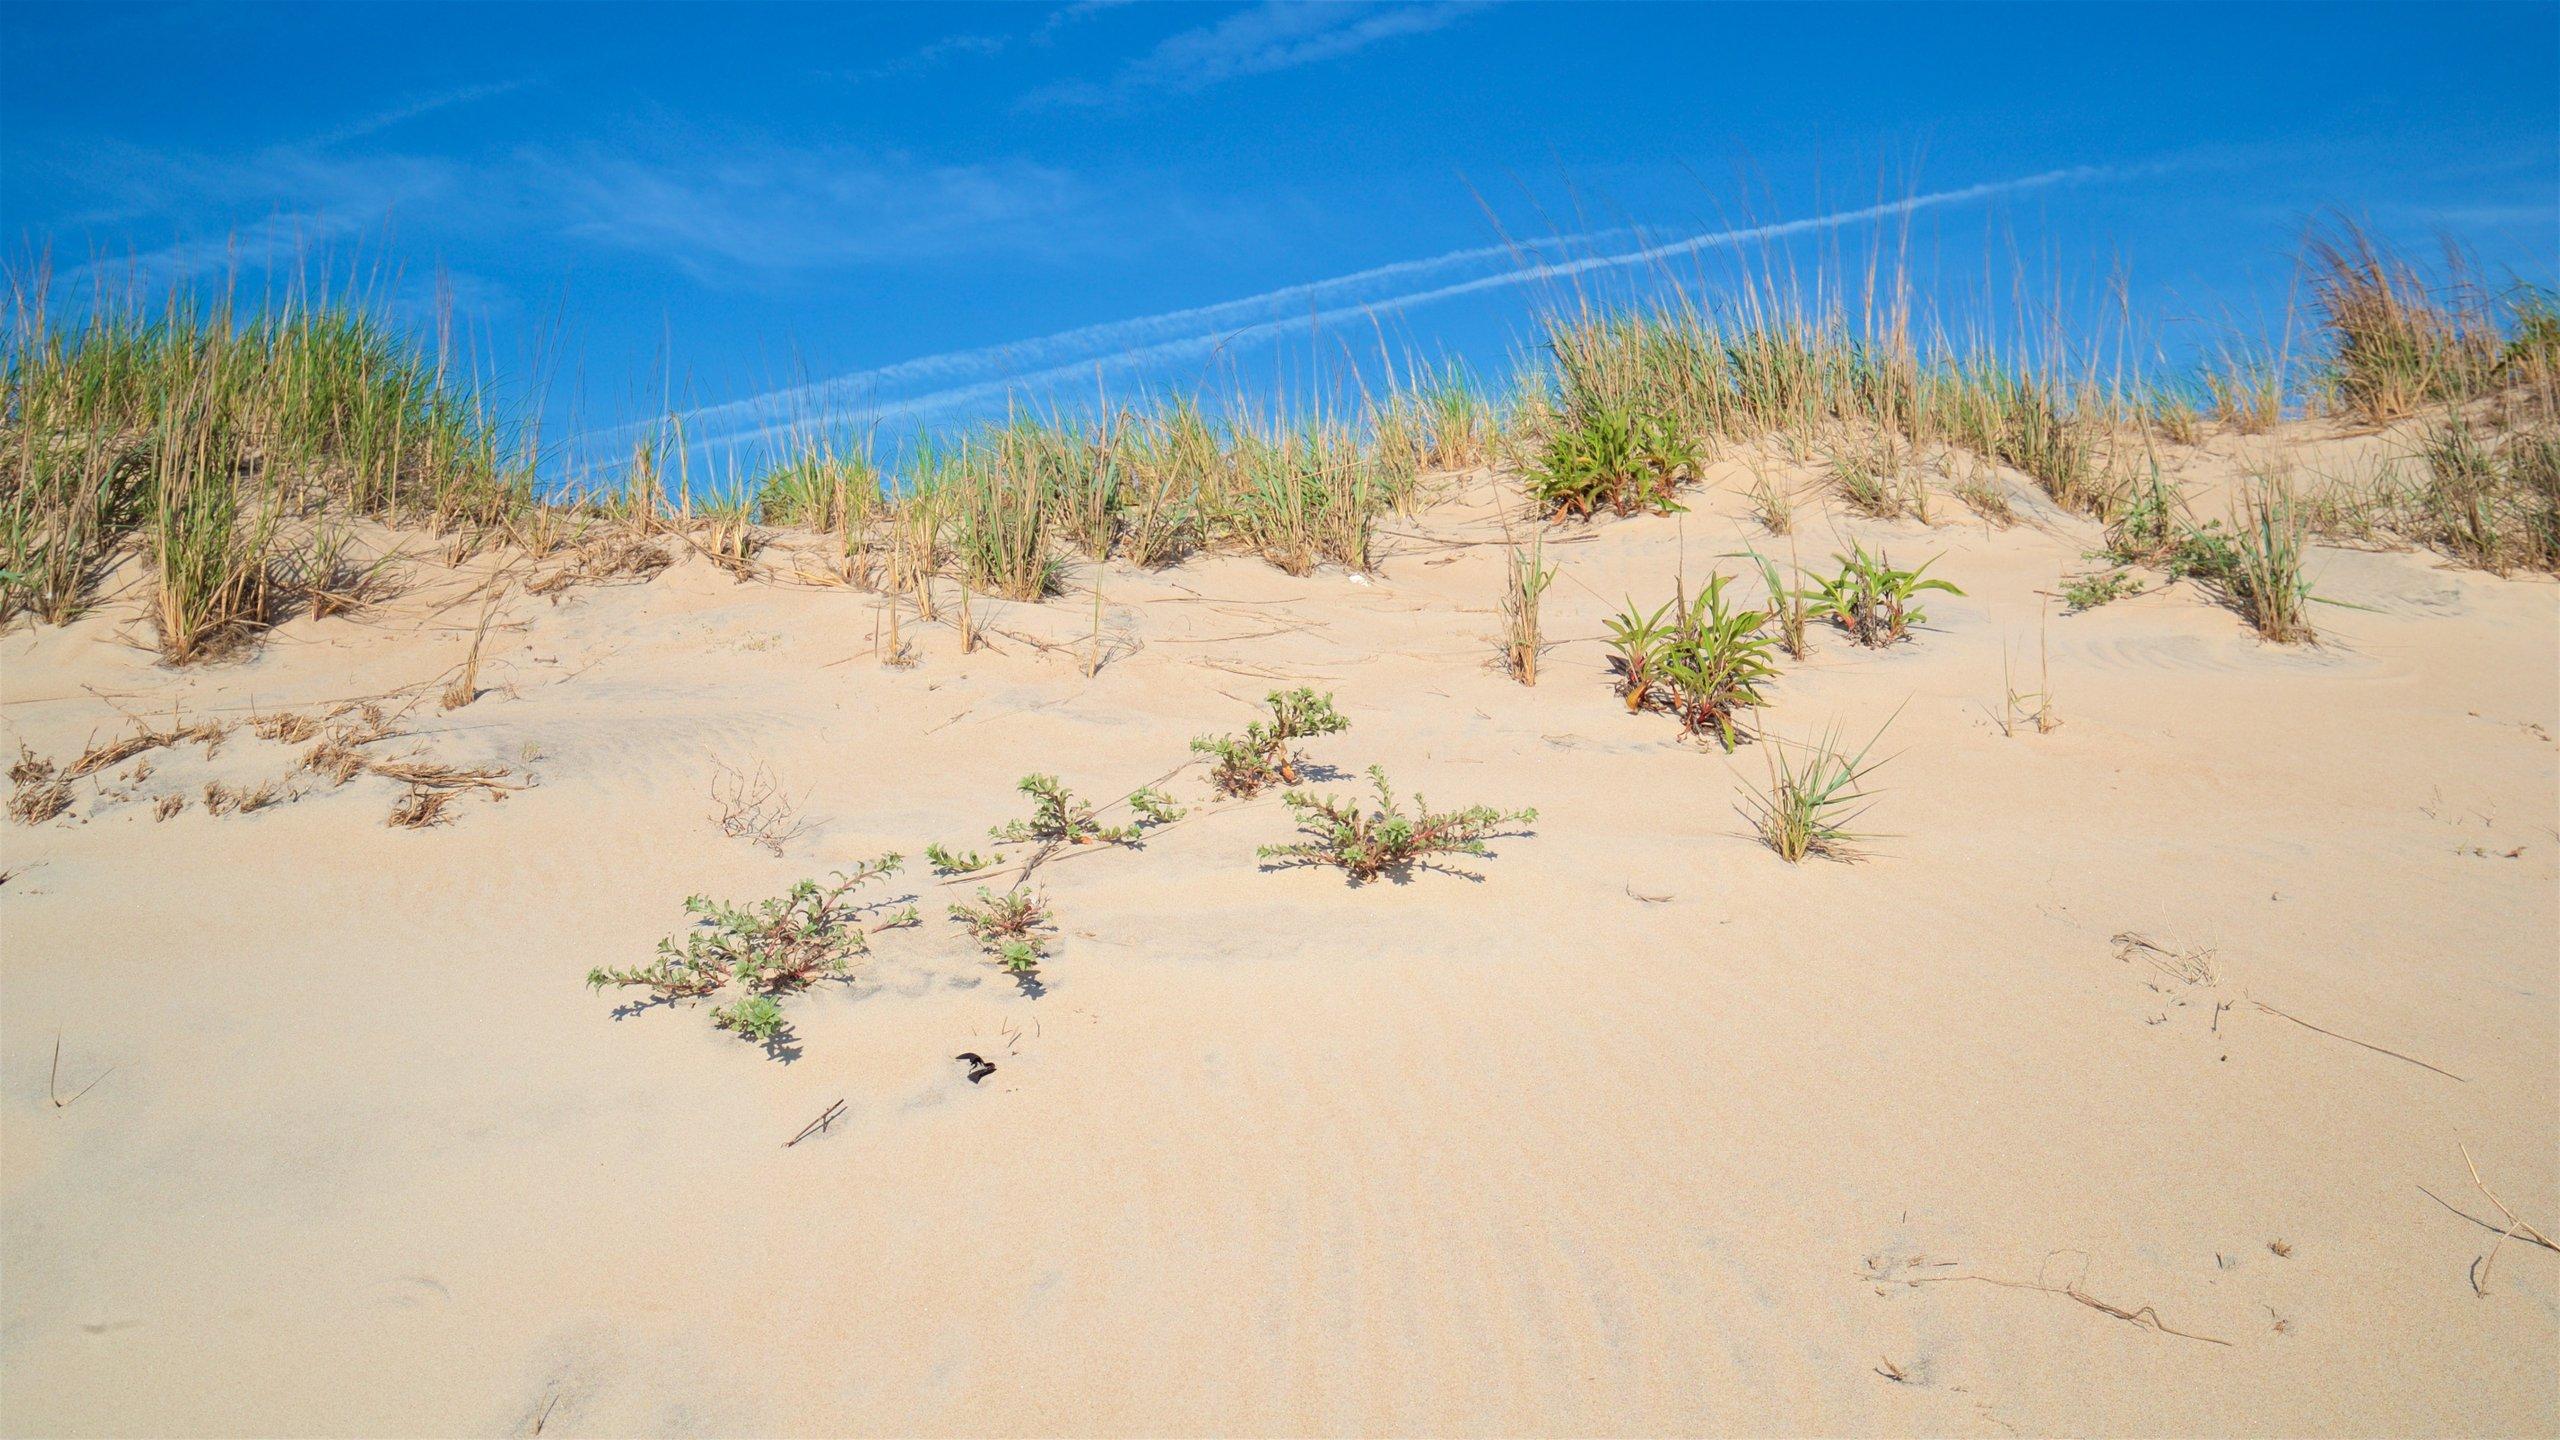 Fenwick Island Beach, Fenwick Island, Delaware, United States of America